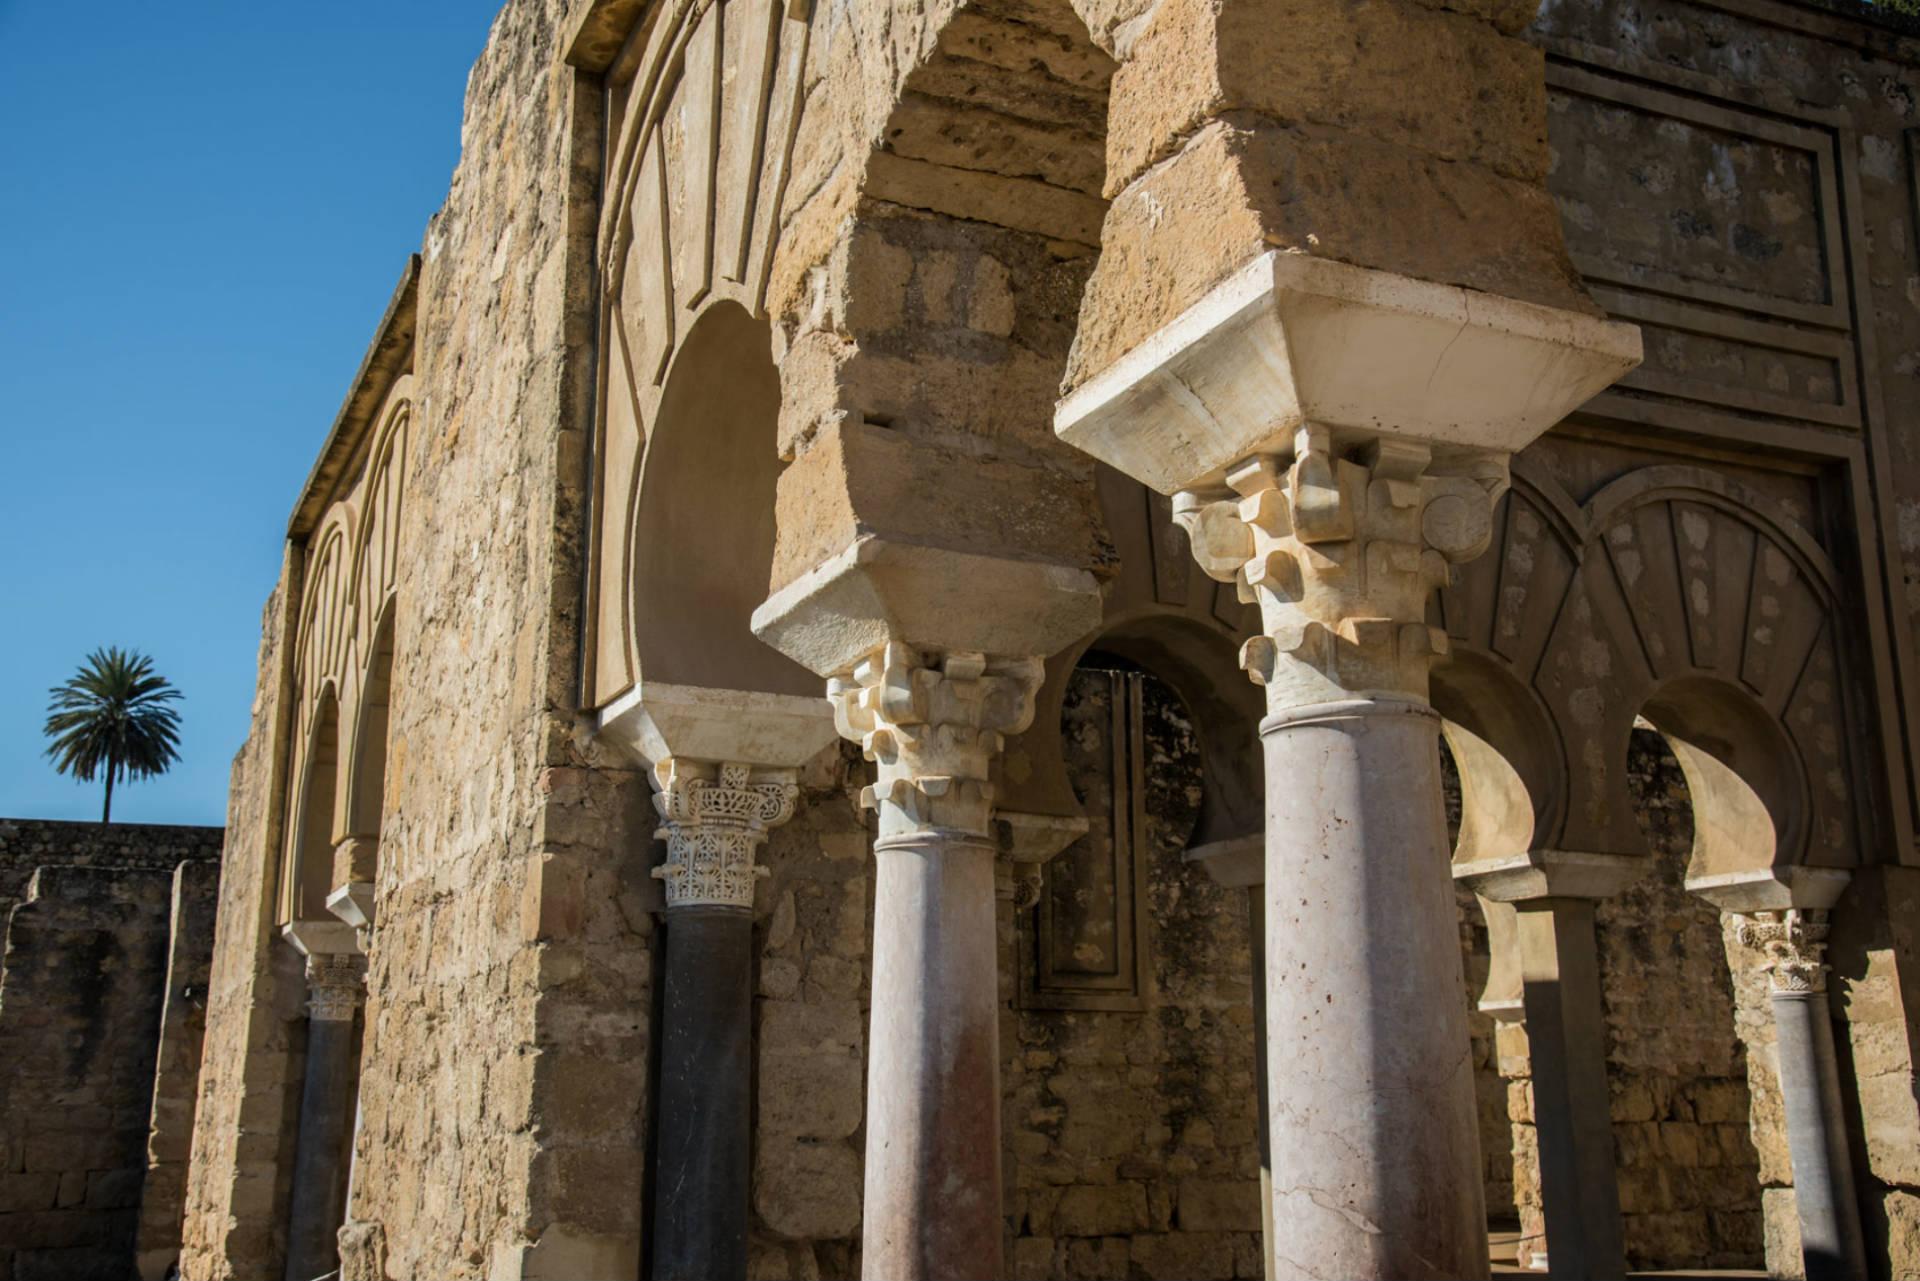 medina-azahara-banner-freetour-cordoba-mpol